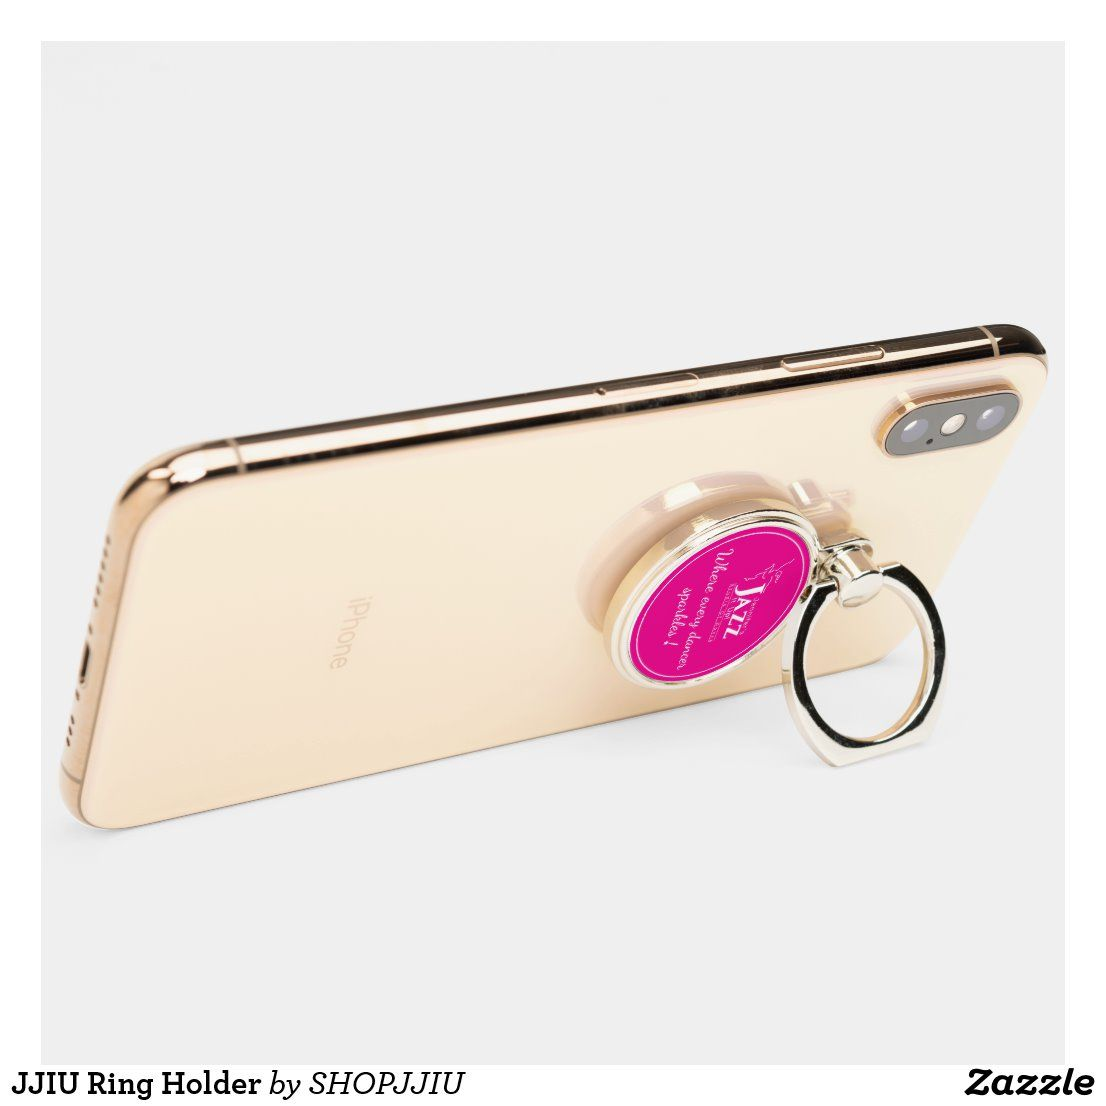 jjiu ring holder for phone